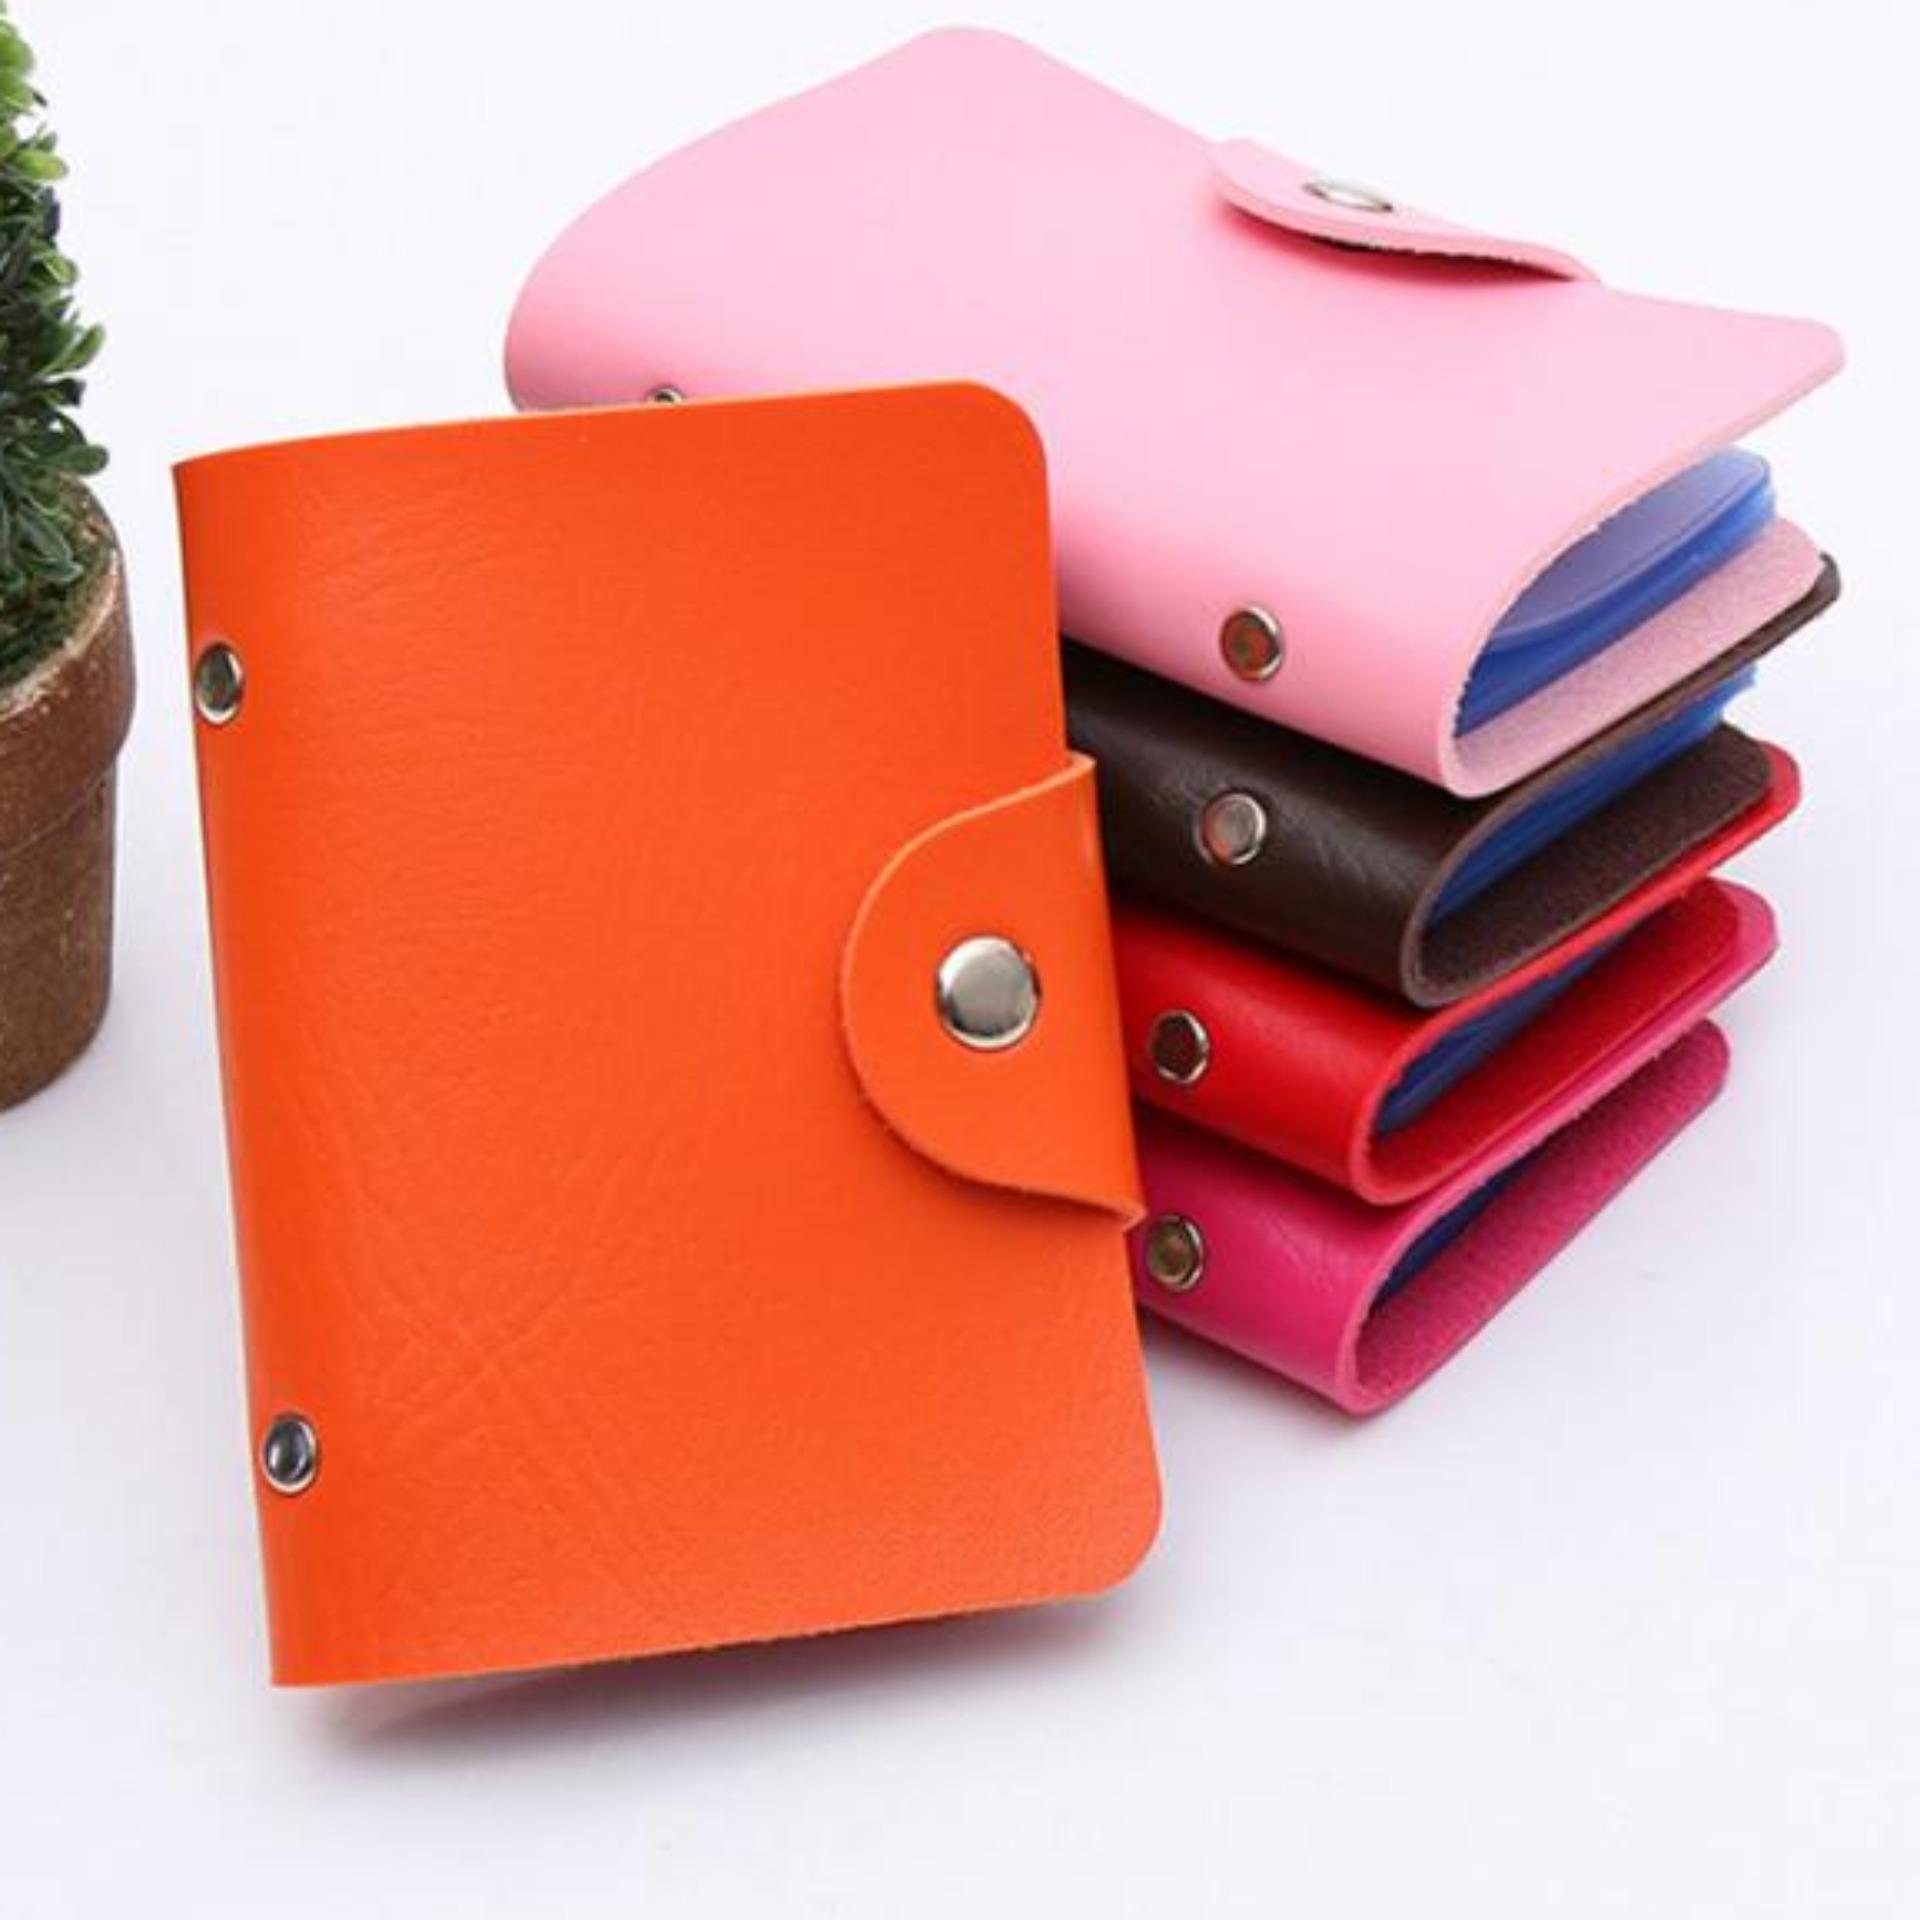 ZeeBee Dompet Kartu 24 Slot - PU Leather Card Holder - Tempat Kartu Nama / Kartu